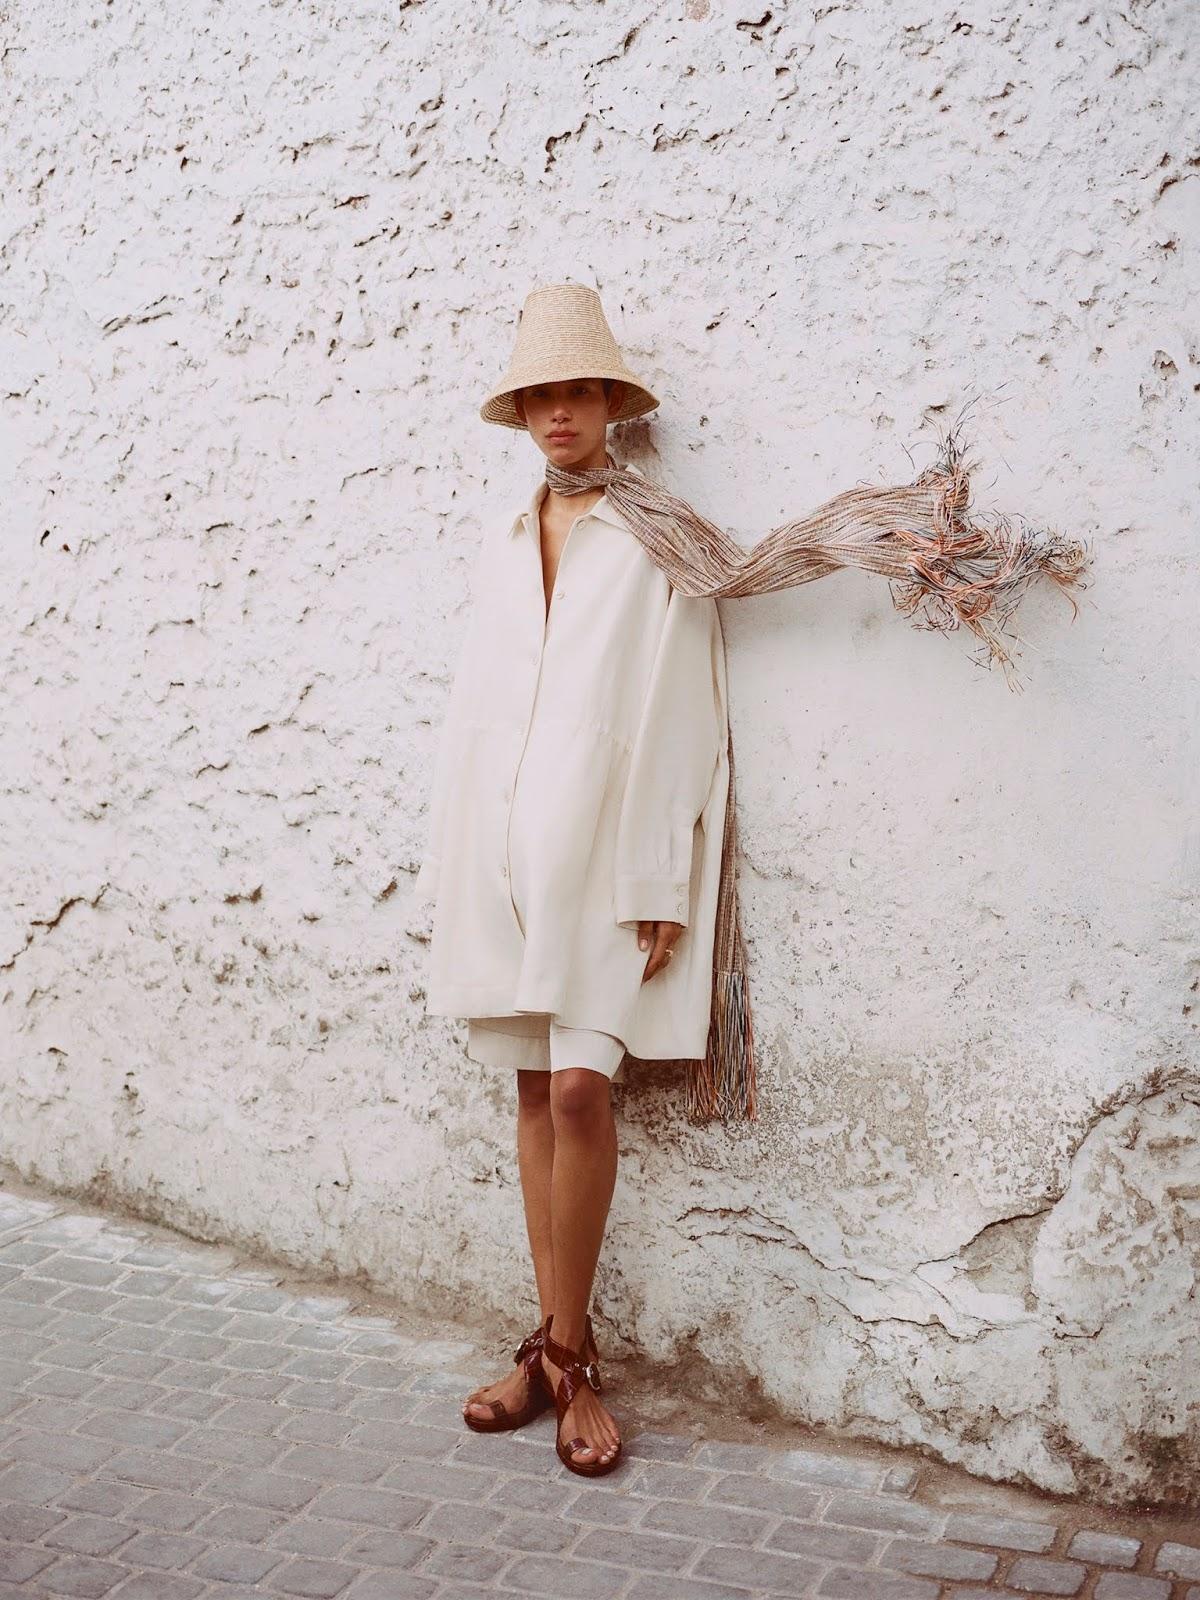 Janeice-Dilone-Sonia-Sziostak-Porter-Edit-May-3-2019 (3).jpg